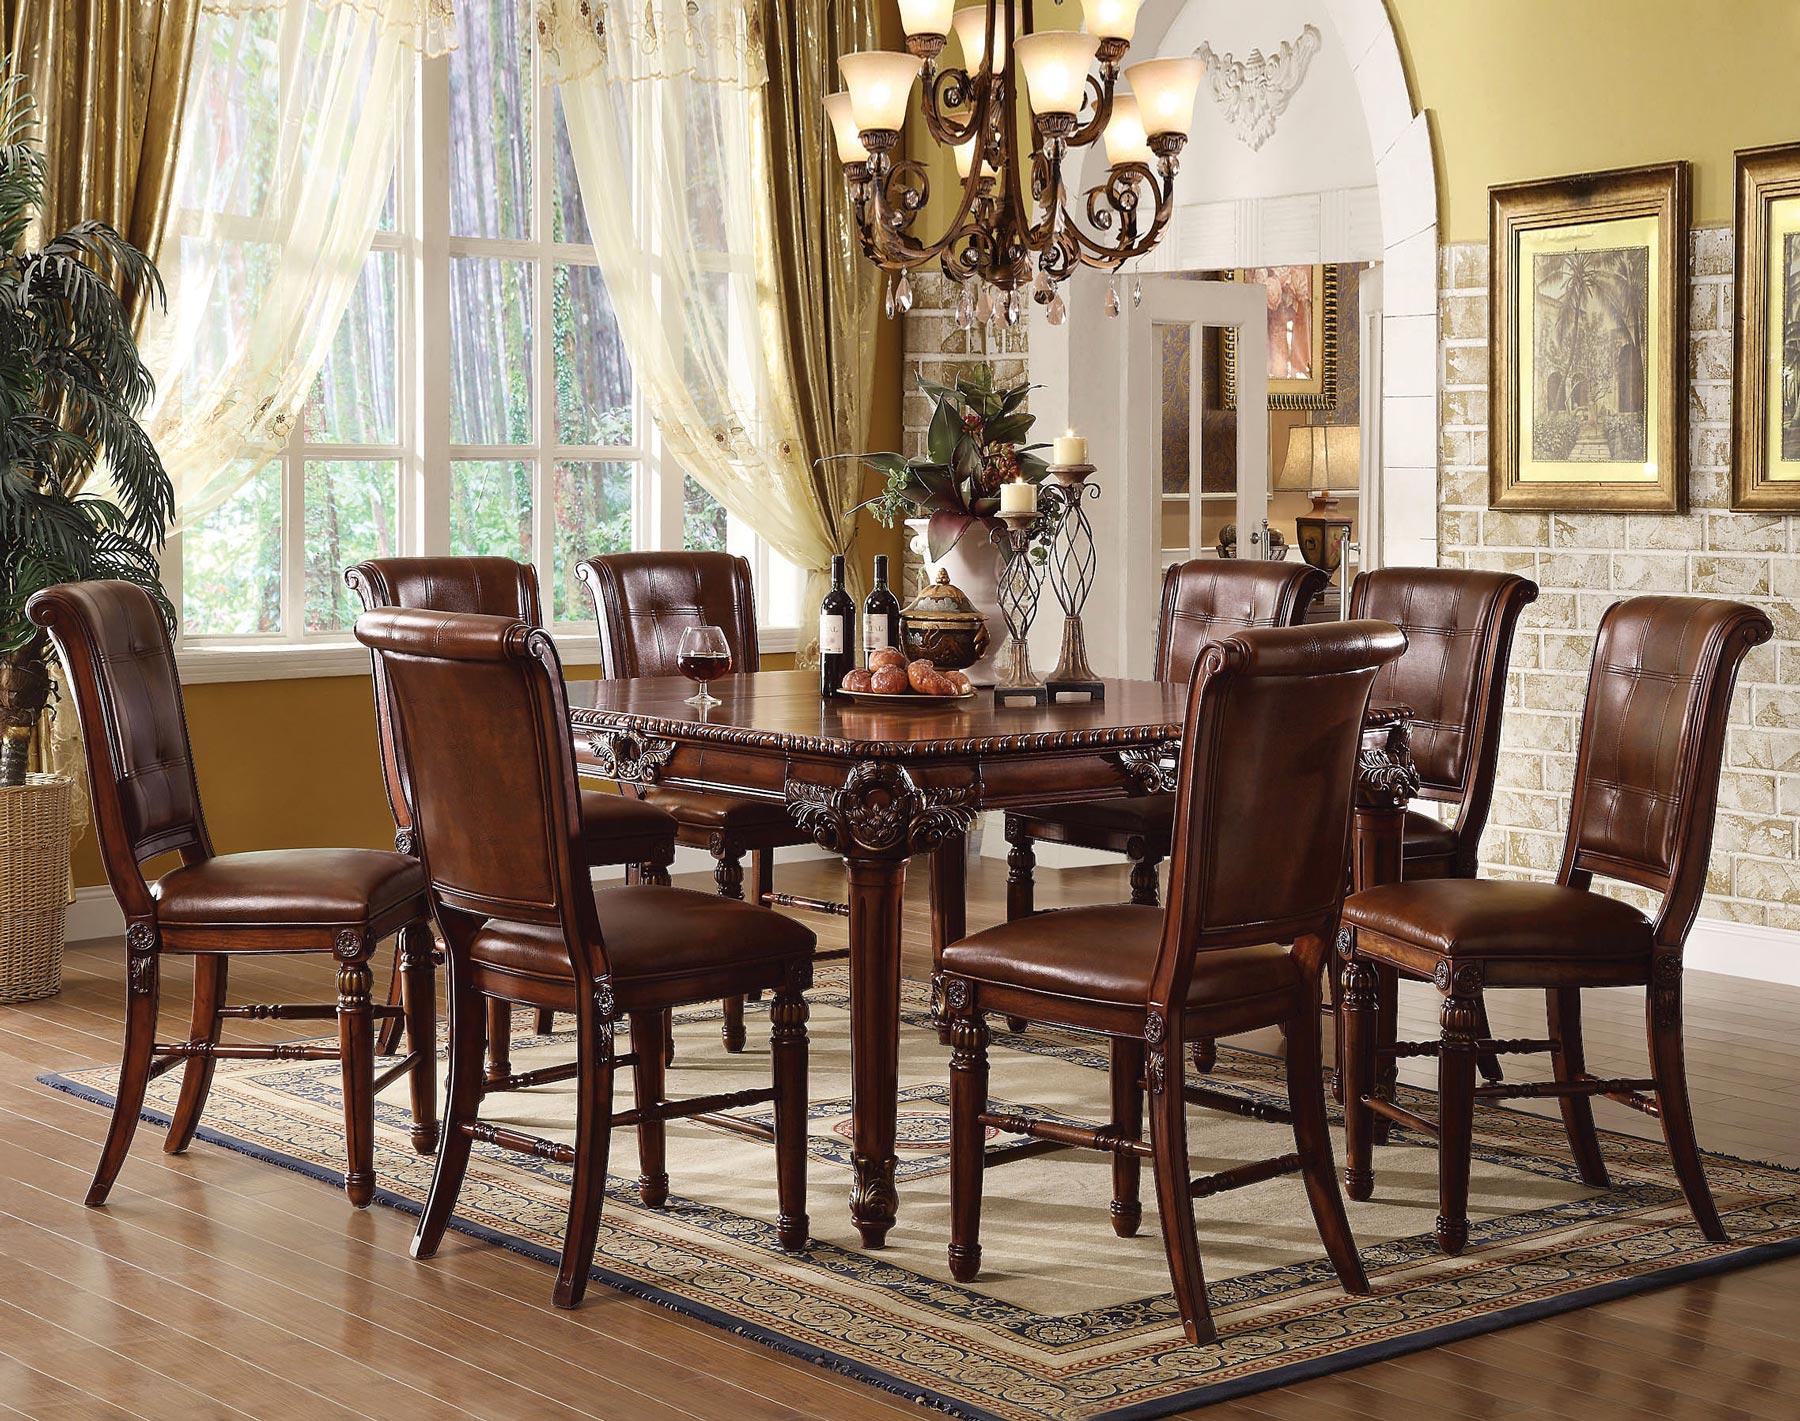 harden dining room furniture | Winfred 7 Piece Dining Room Set | Gonzalez Furniture